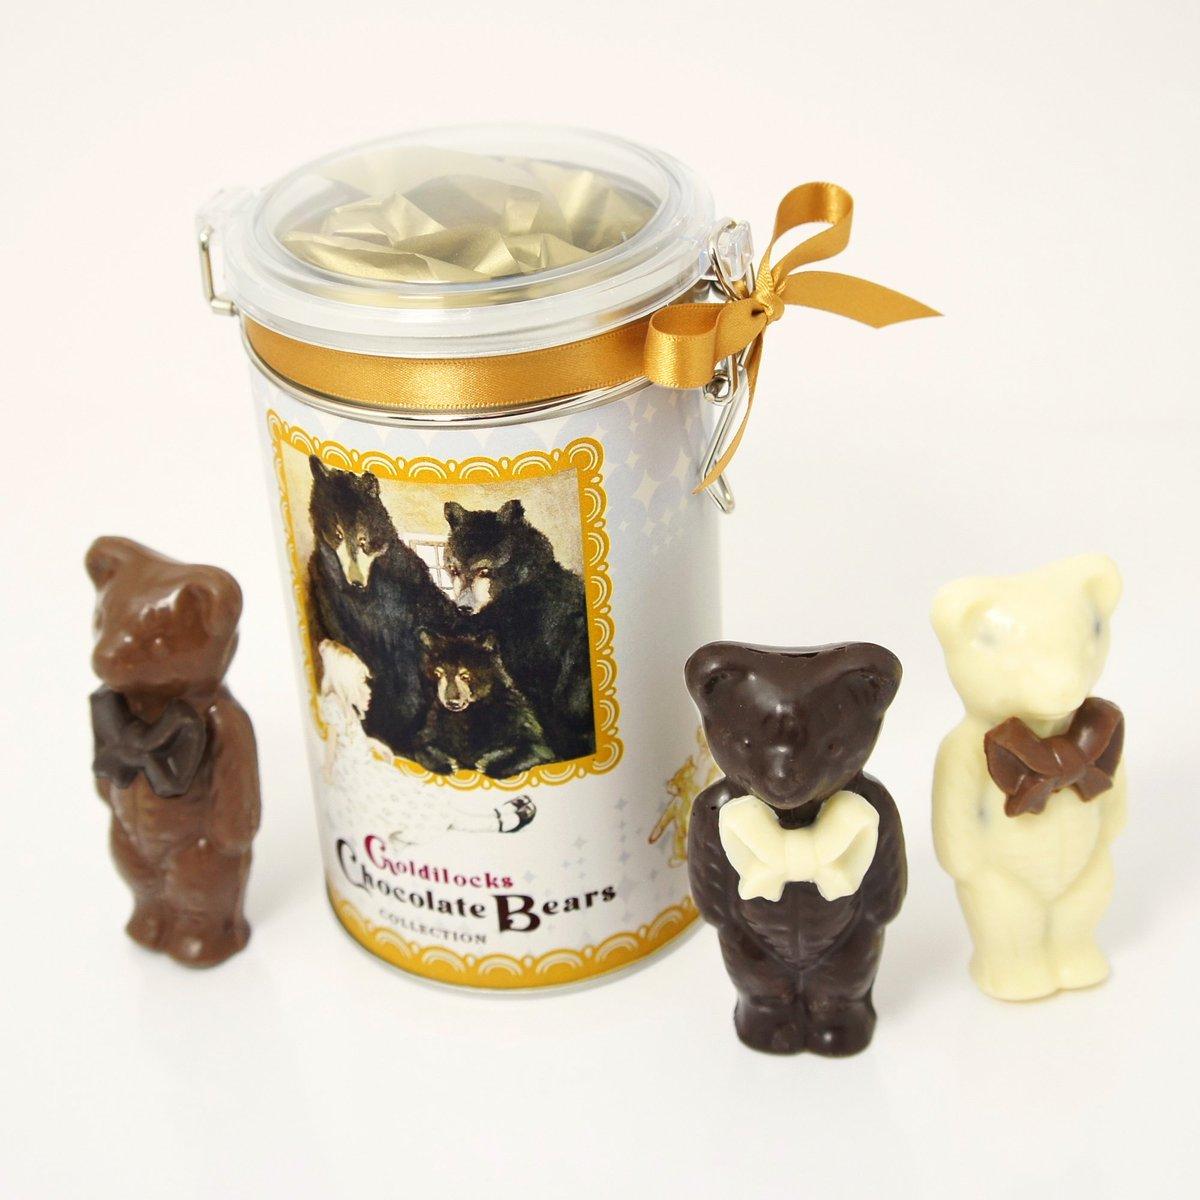 #winitwednesday RT & Follow @FairyTGourmet to #win set of bears at 14K. https://t.co/lIYspj39dg https://t.co/scNsbimQSk